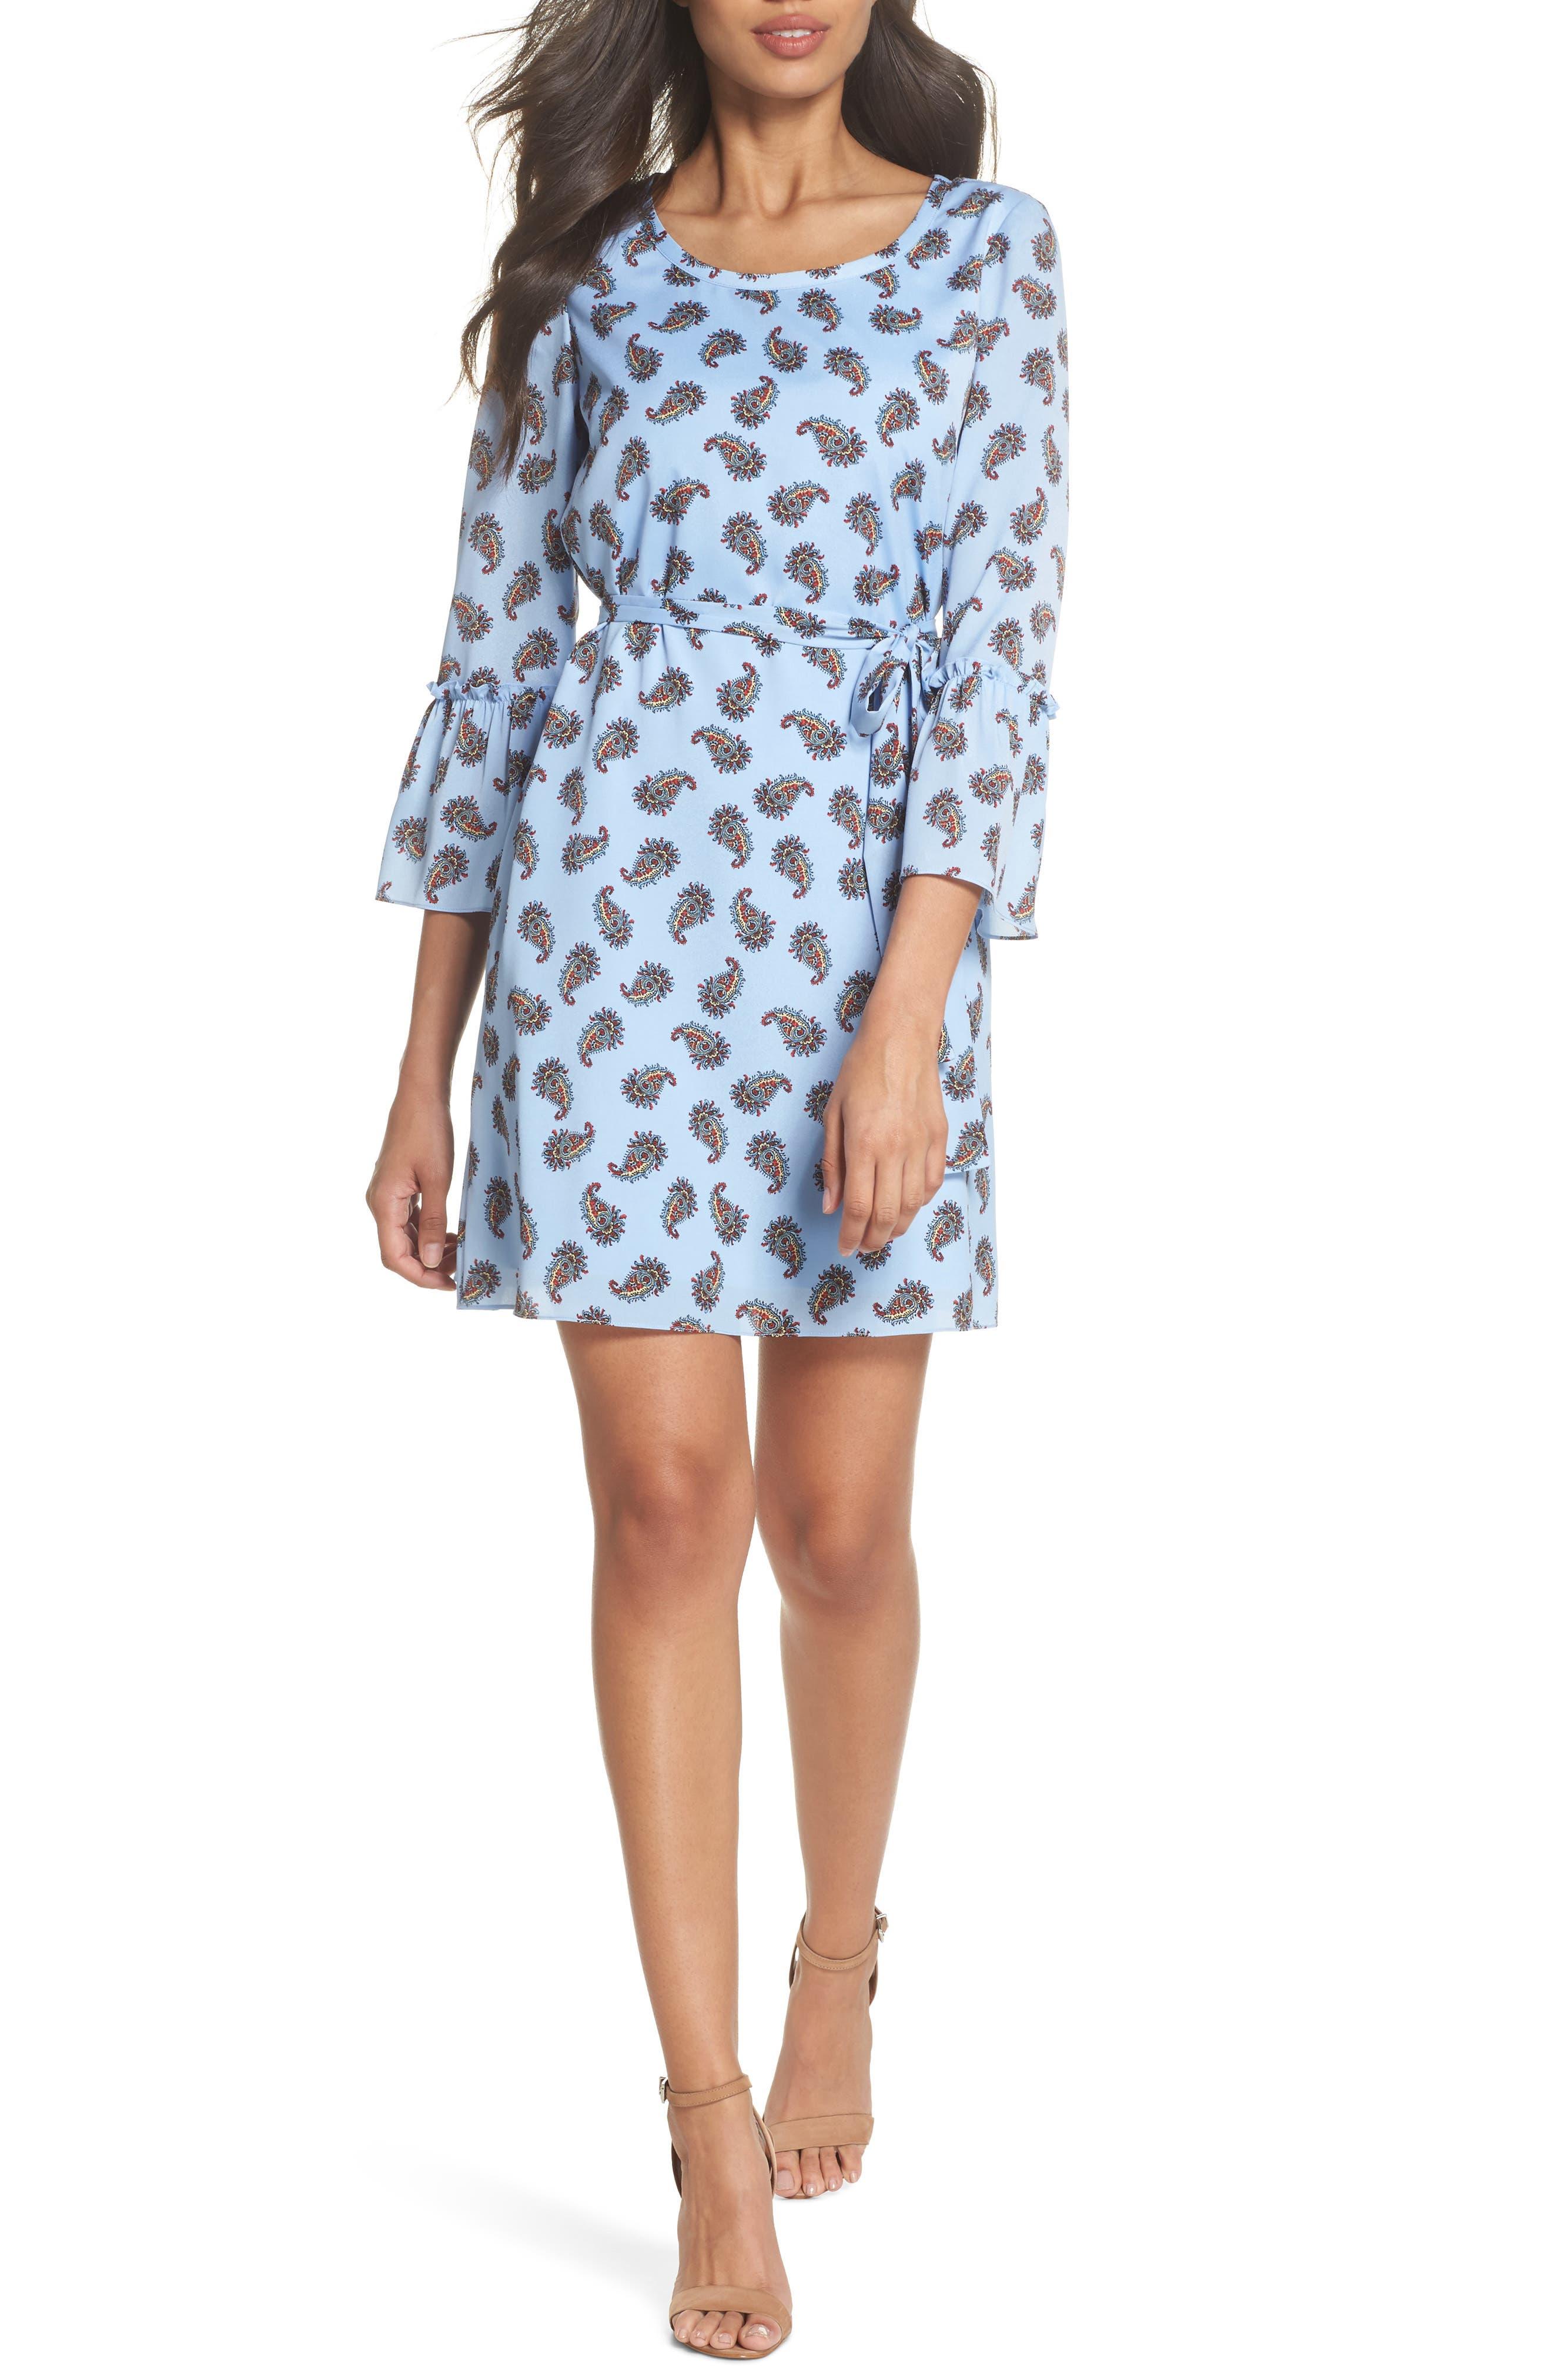 Orli Paisley Print Bell Sleeve Dress,                         Main,                         color, Blue Multi